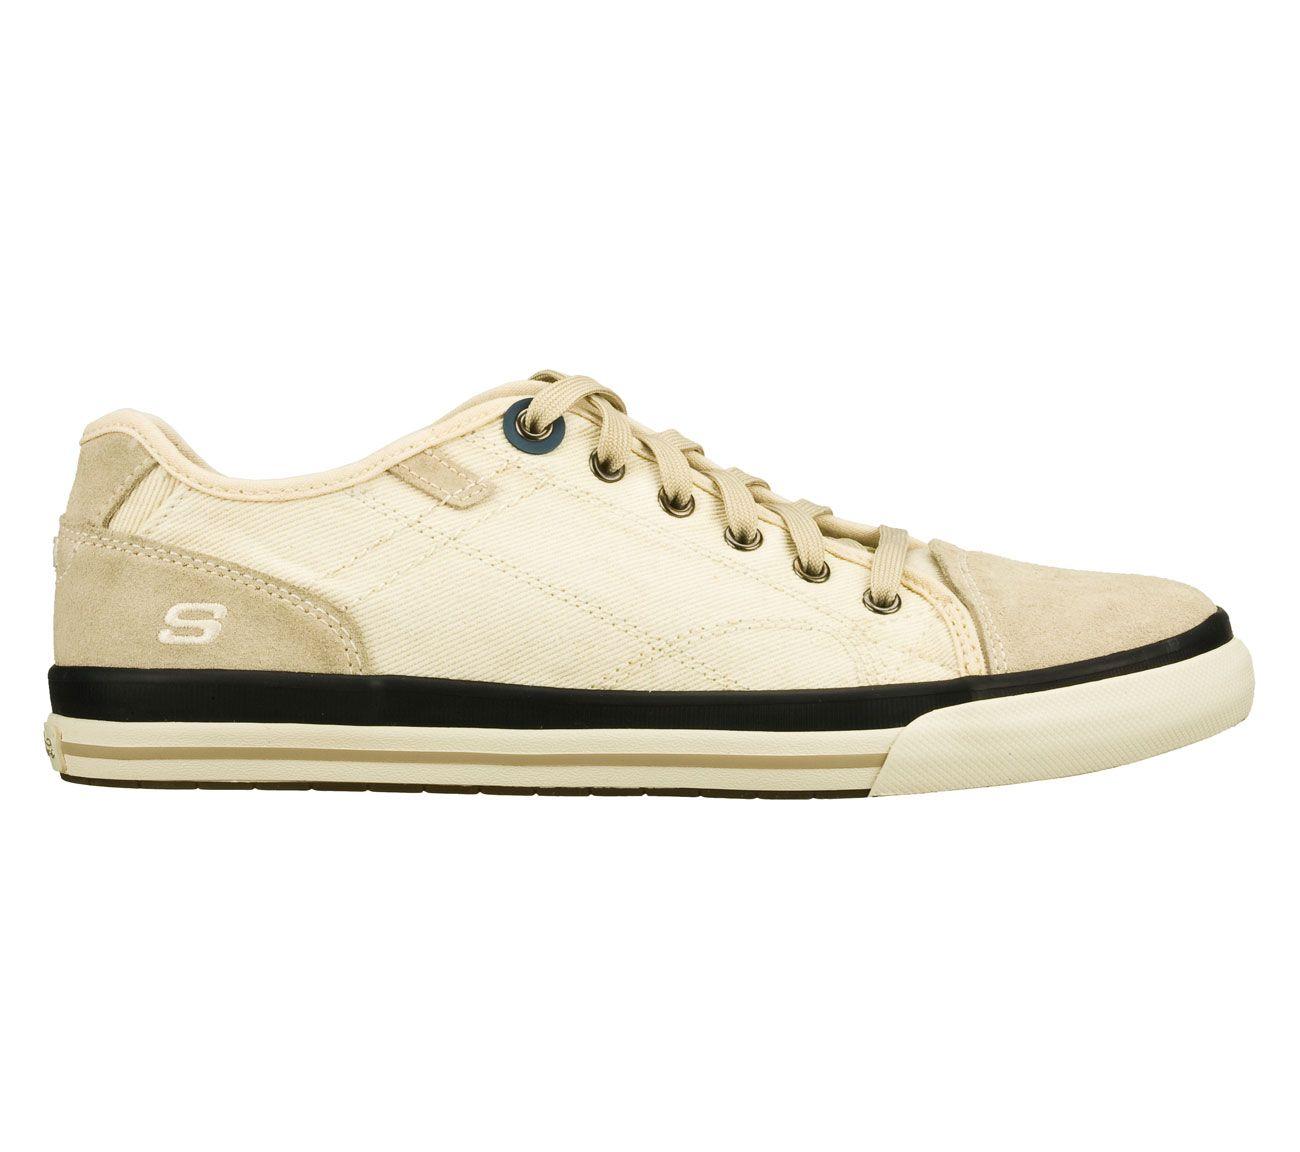 Individualidad camioneta vaquero  Men's Relaxed Fit: Diamondback - Levon | Skechers mens shoes, Skechers  shoes, Skechers